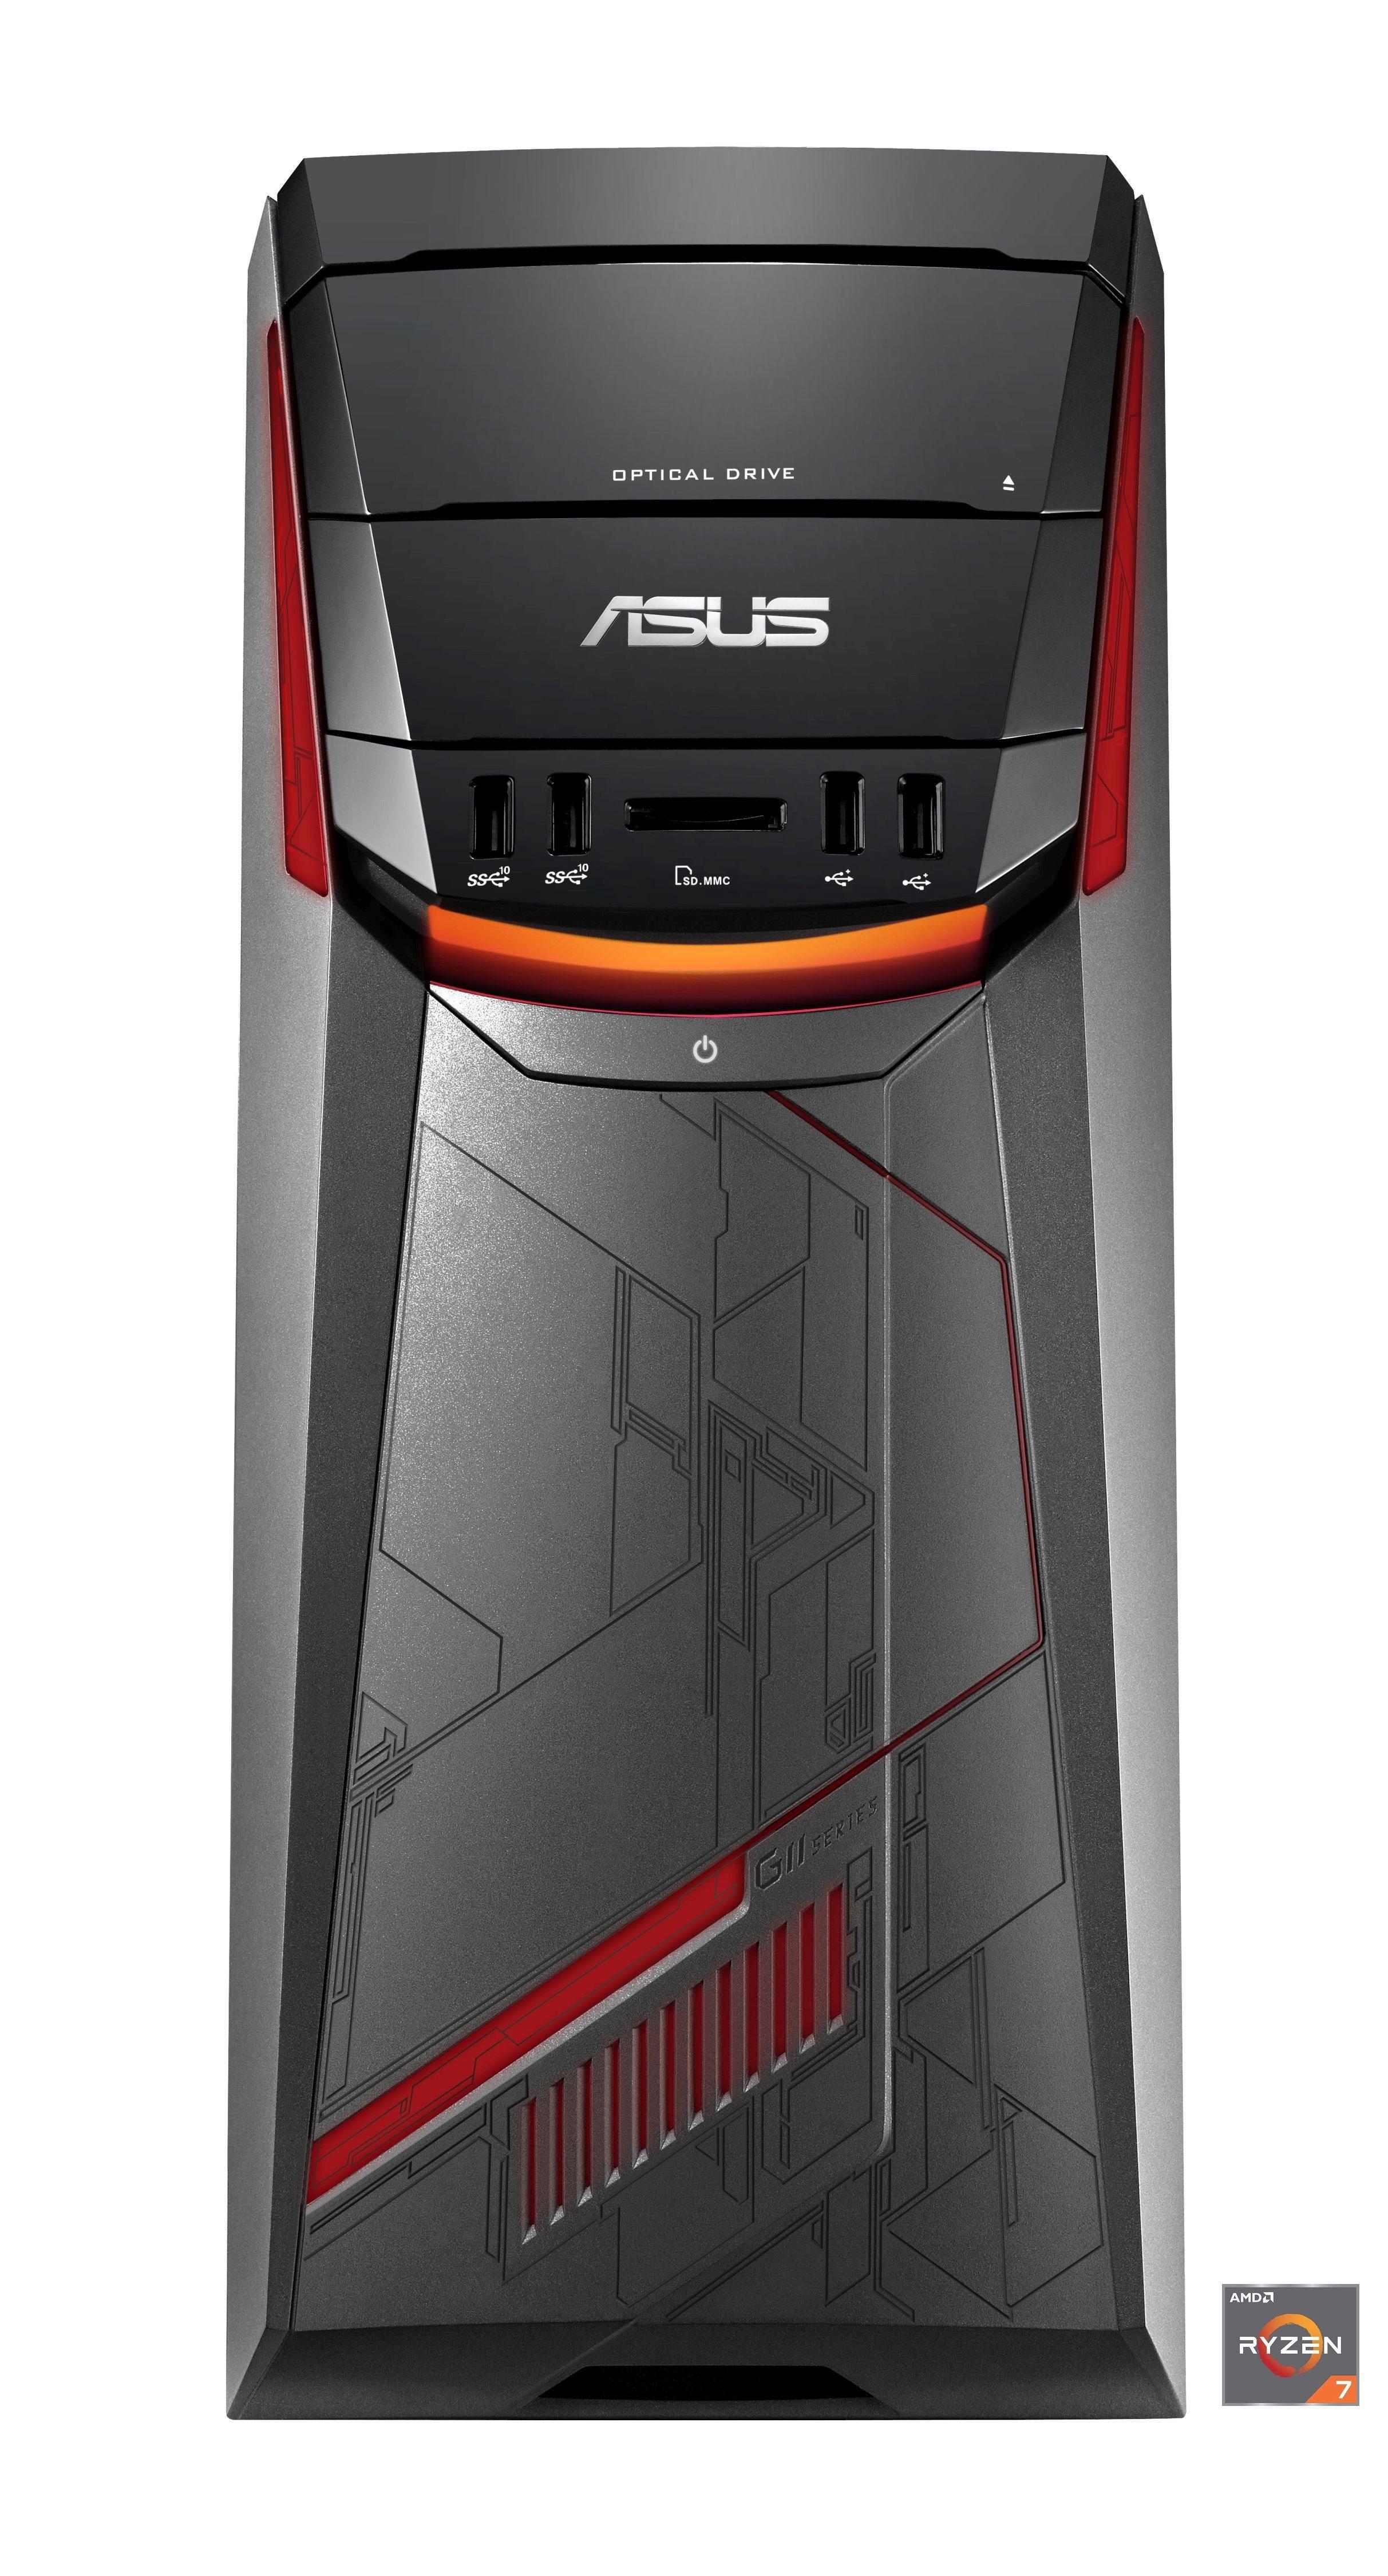 ASUS G11DF-DE015T Gaming-PC »AMD 8-Core, GTX 1070, 256 GB SSD + 1 TB HDD, 8 GB«